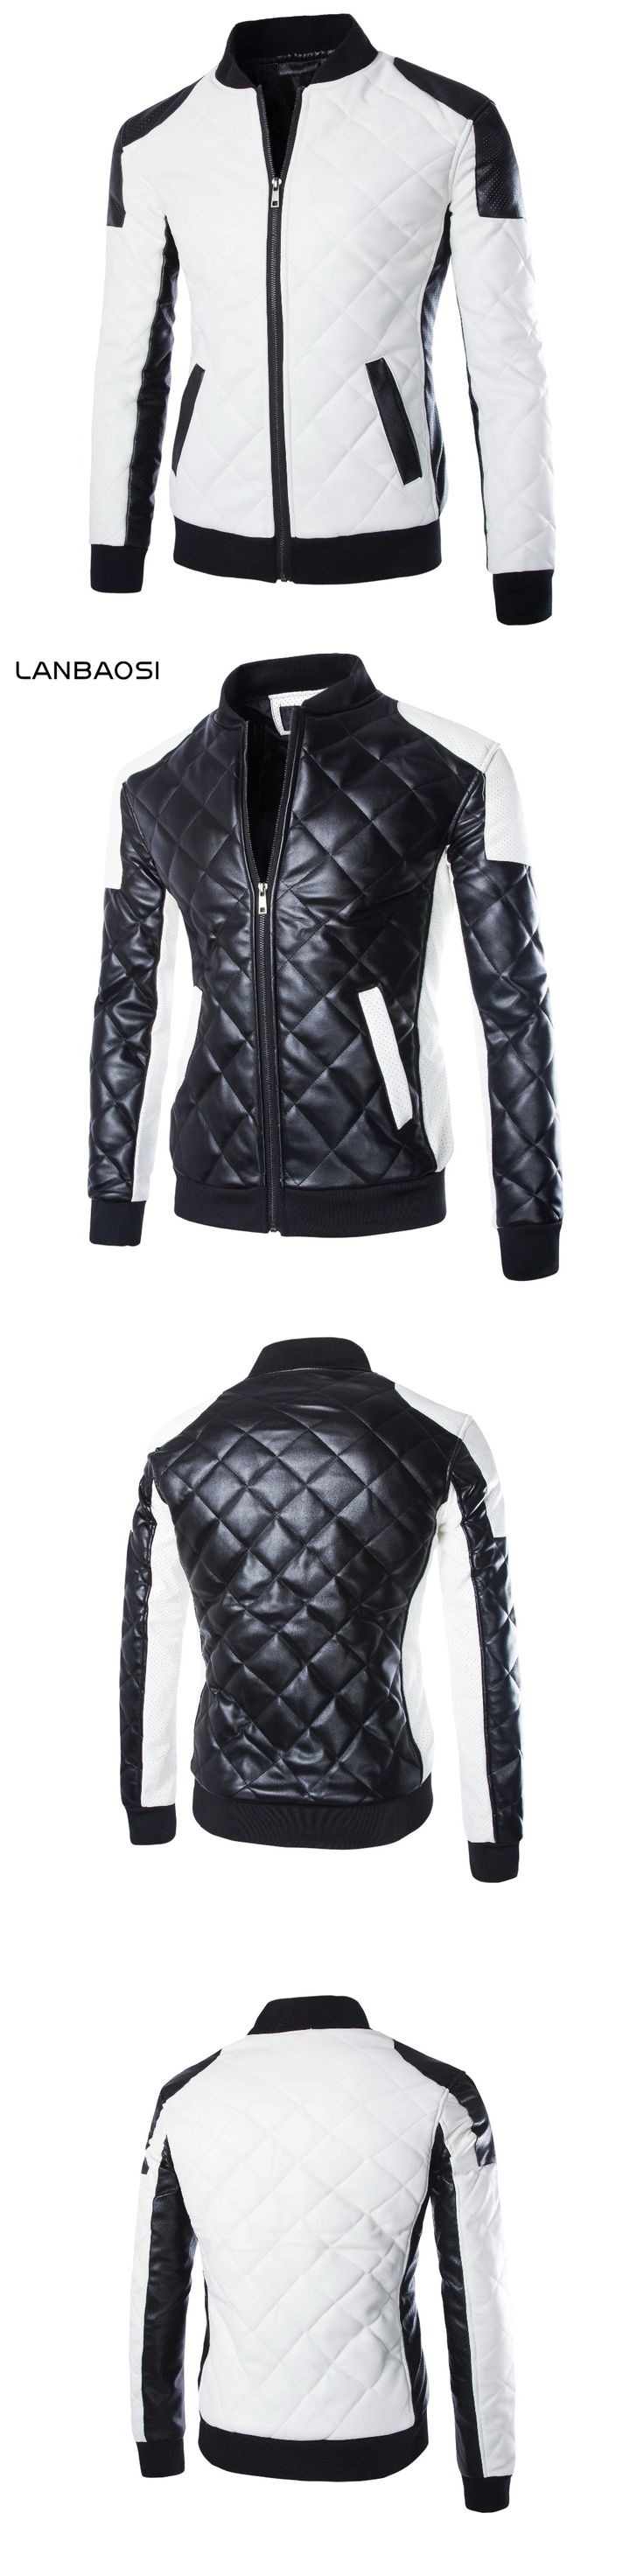 LANBAOSI PU Leather Motorcycle Jacket Men Jaqueta Couro Rib Bottom Patchwork Mandarin Collar Inverno Couro Jacket Coat Plus Size